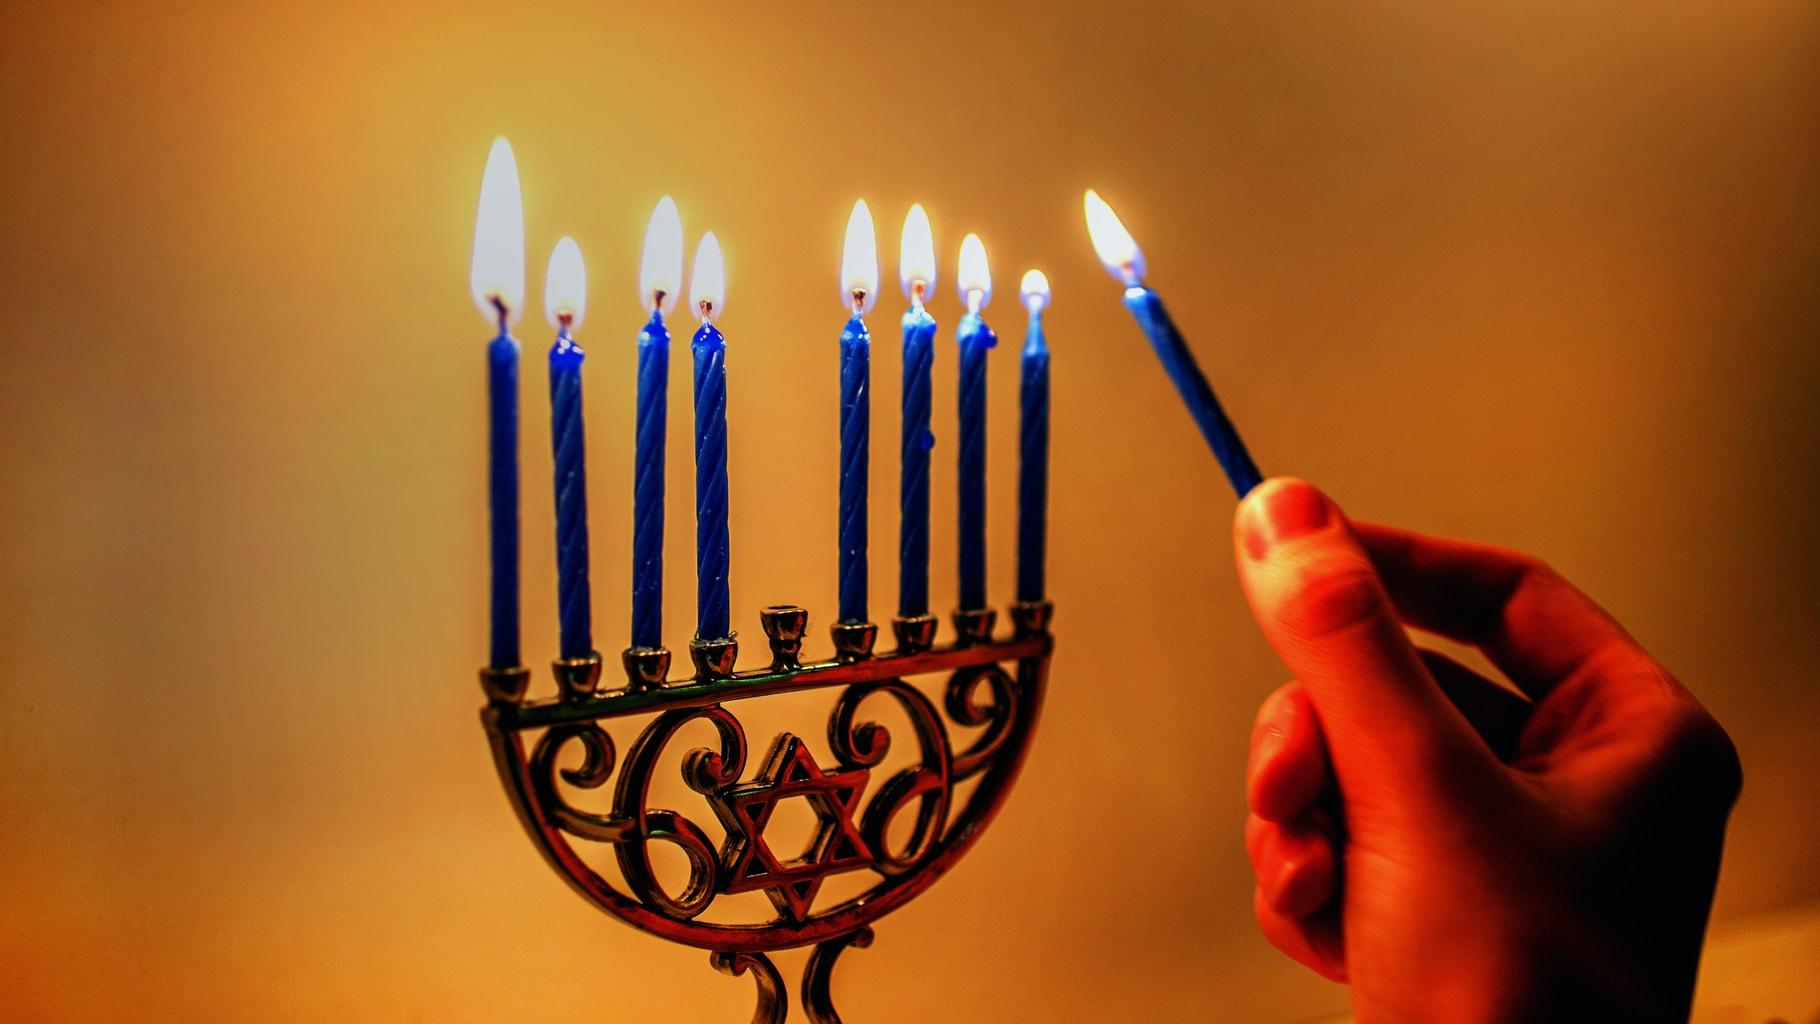 Woman lighting a small Hanukkah menorah with blue candles